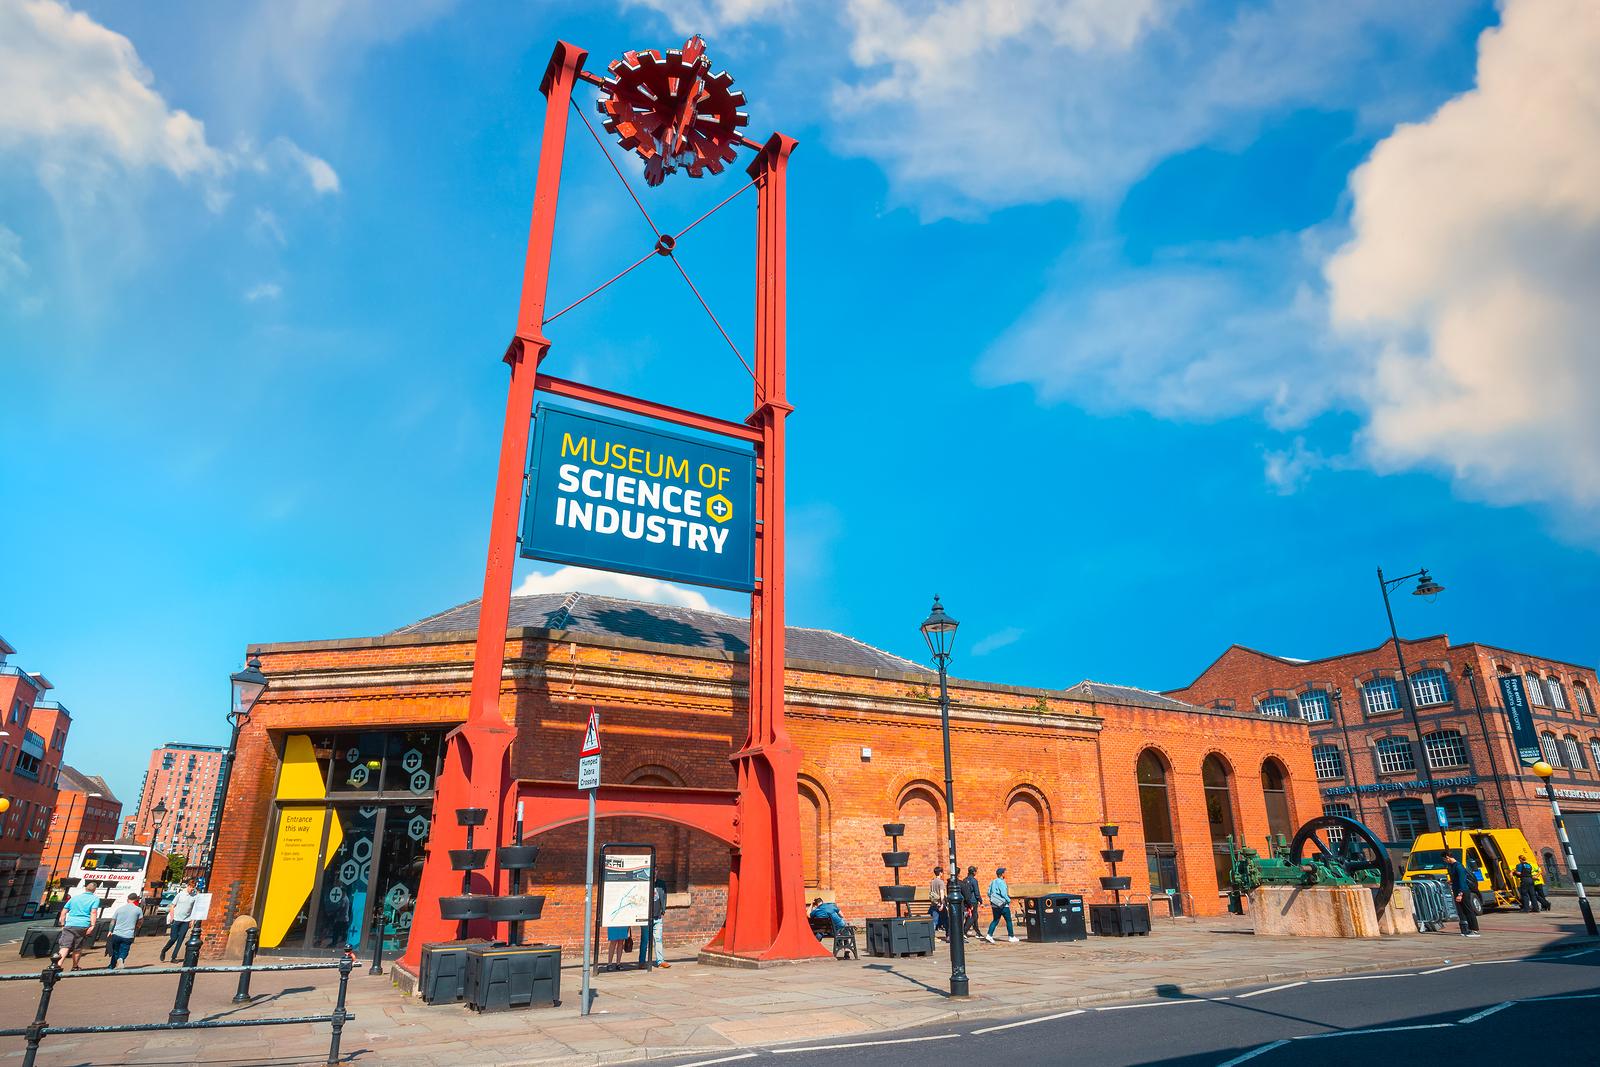 MoSI Manchester